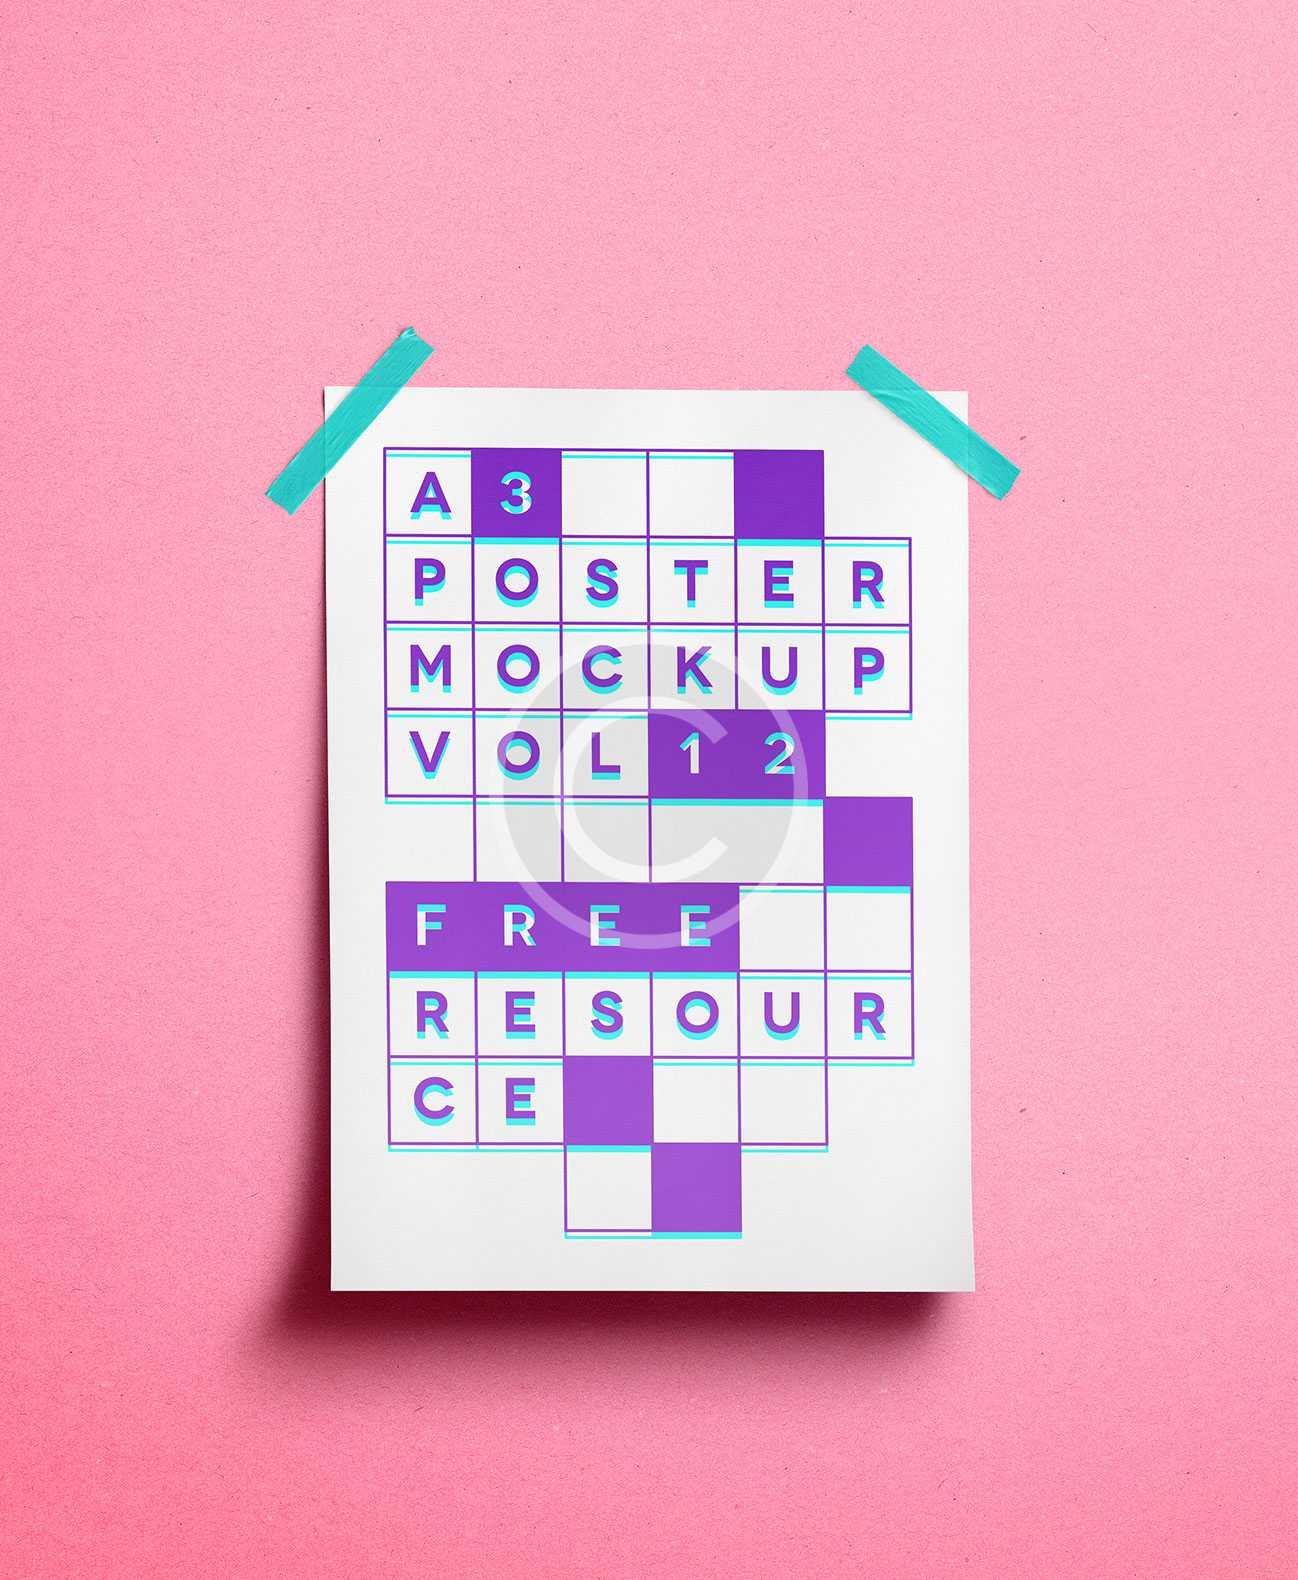 Creative poster idea